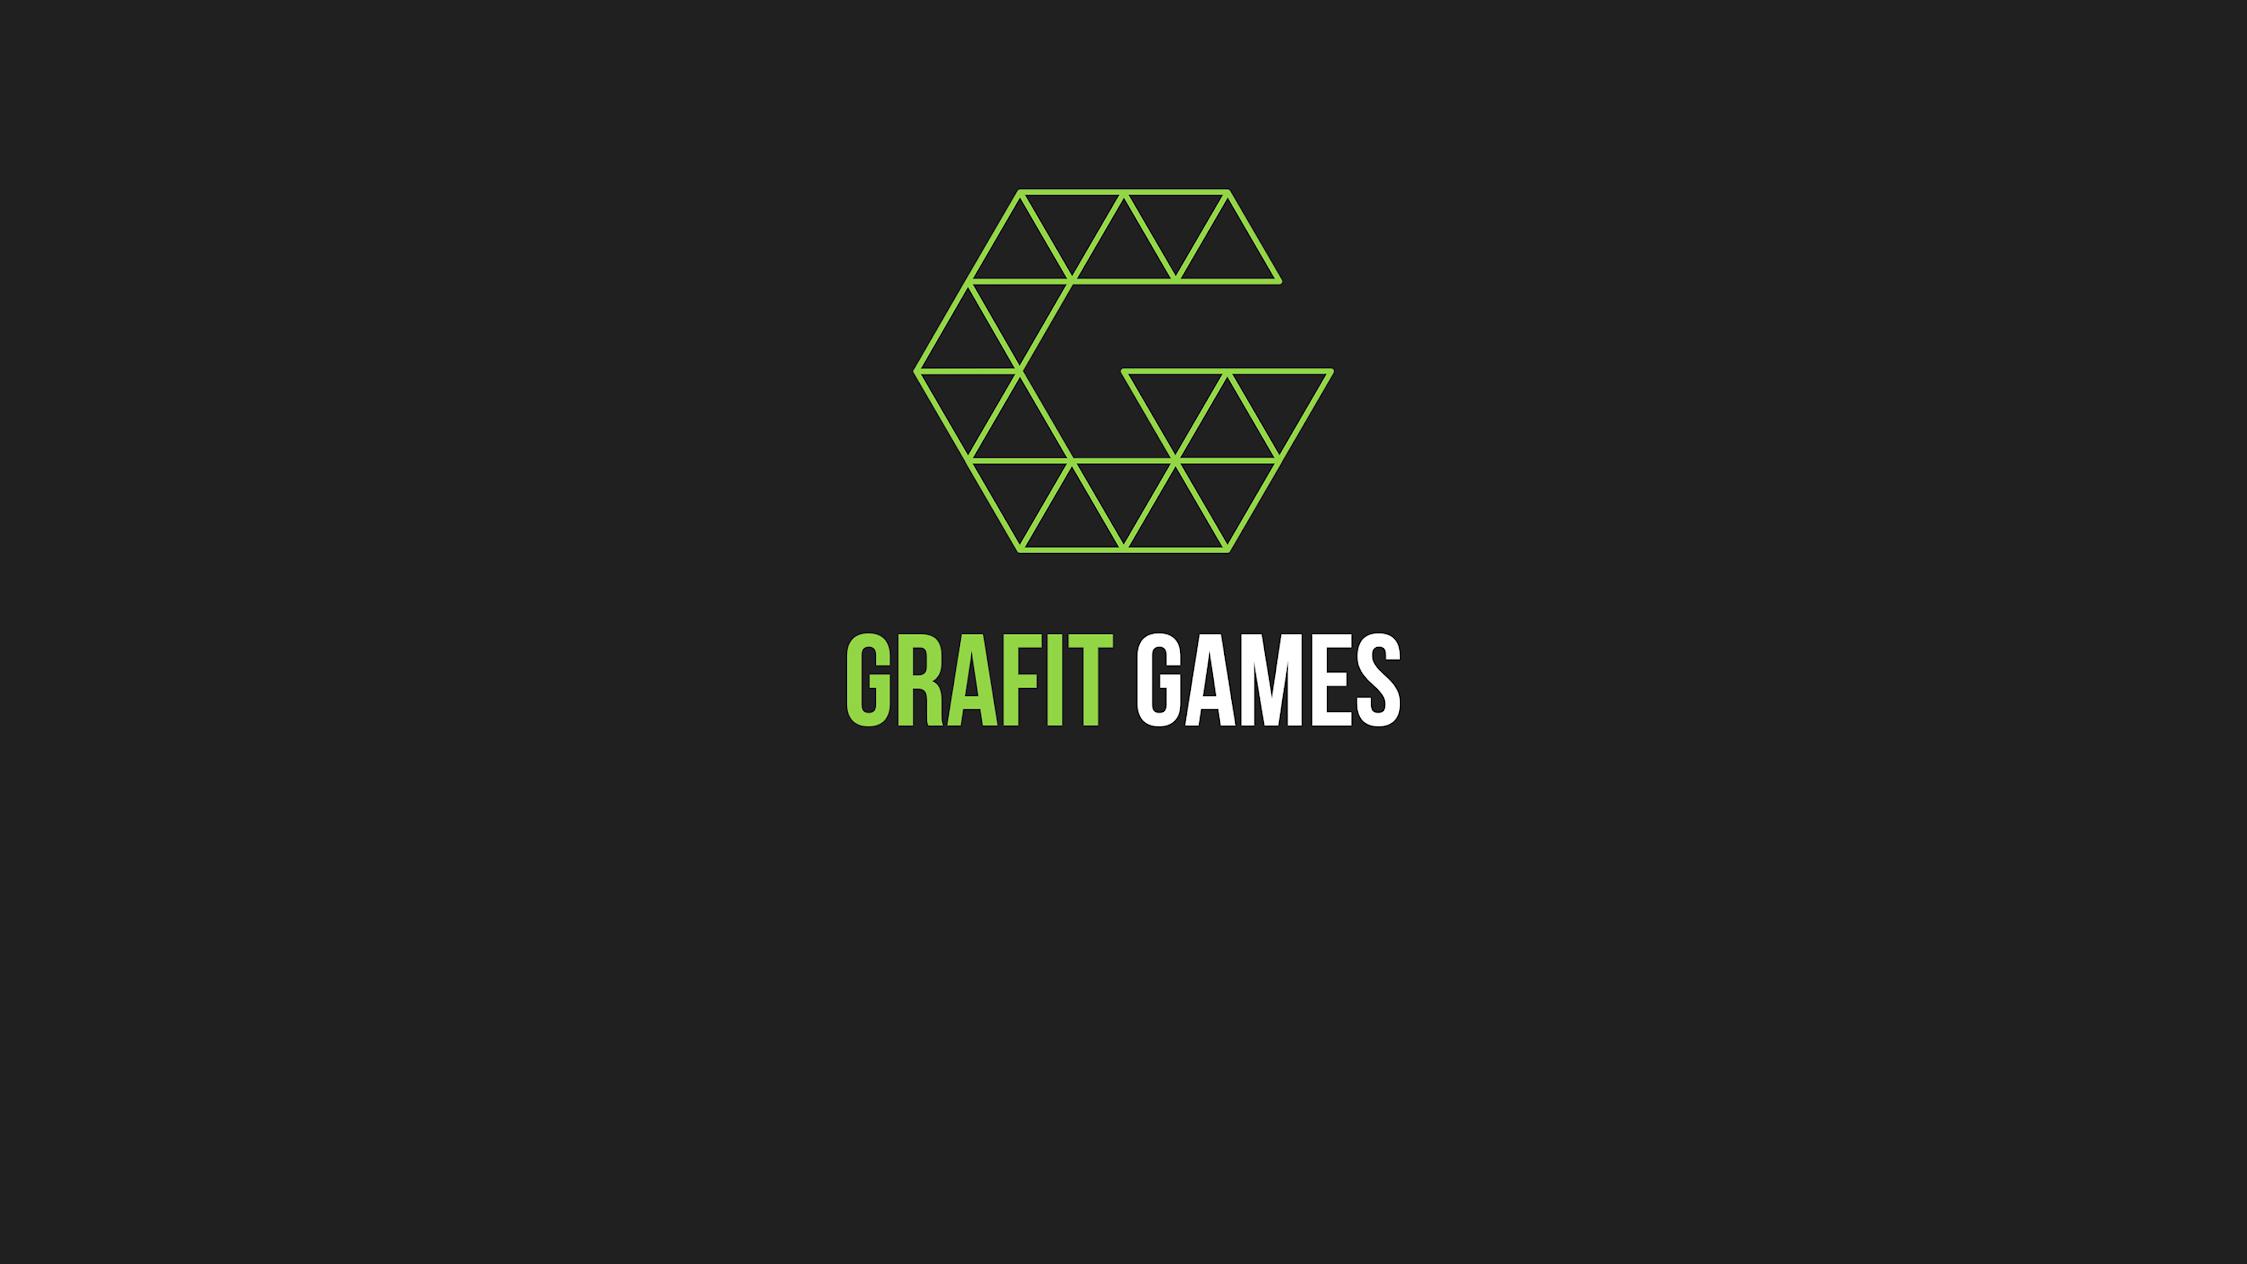 Grafit Games